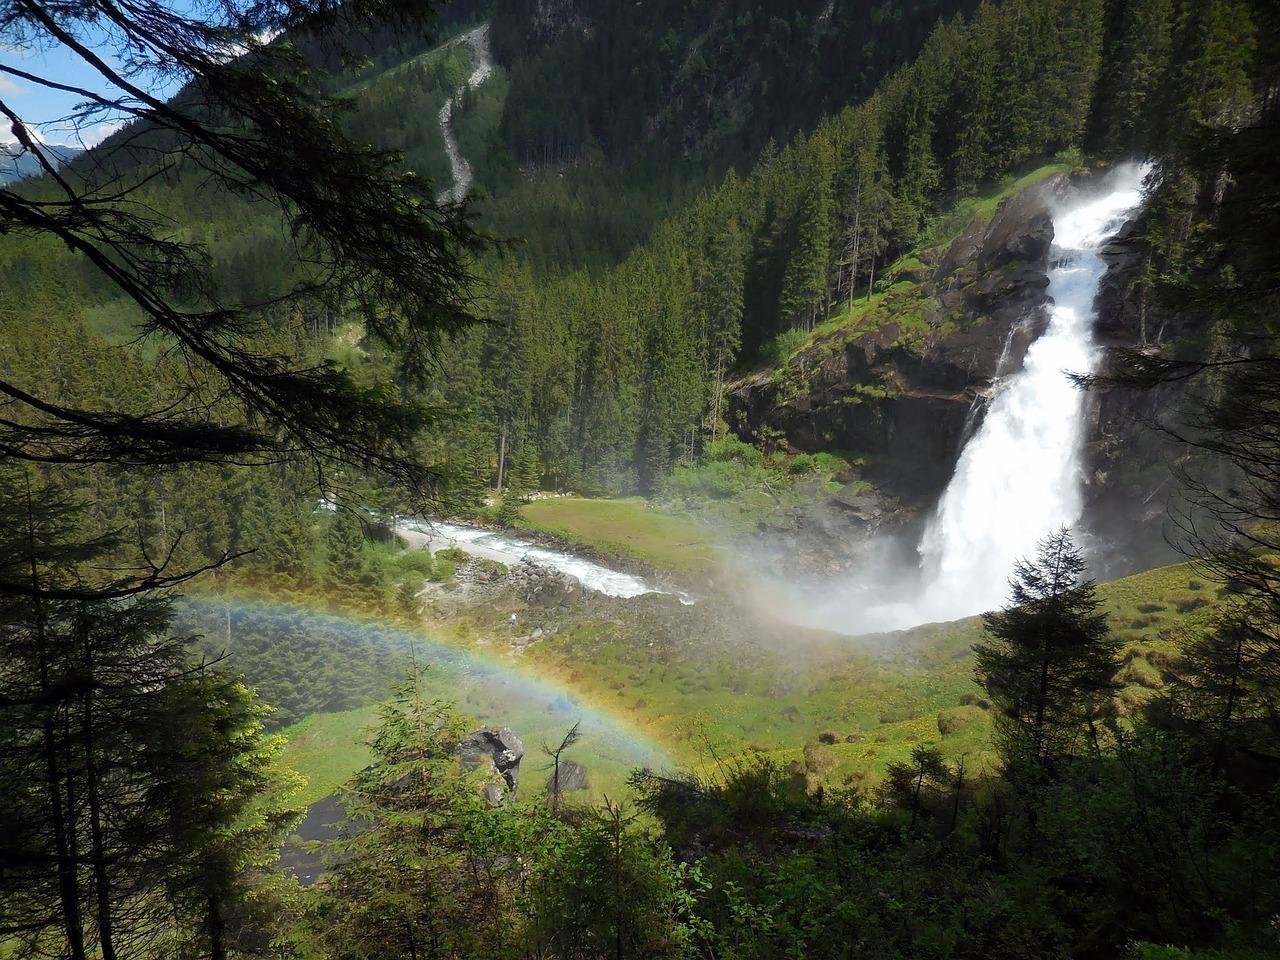 waterfall-992603_1280.jpg